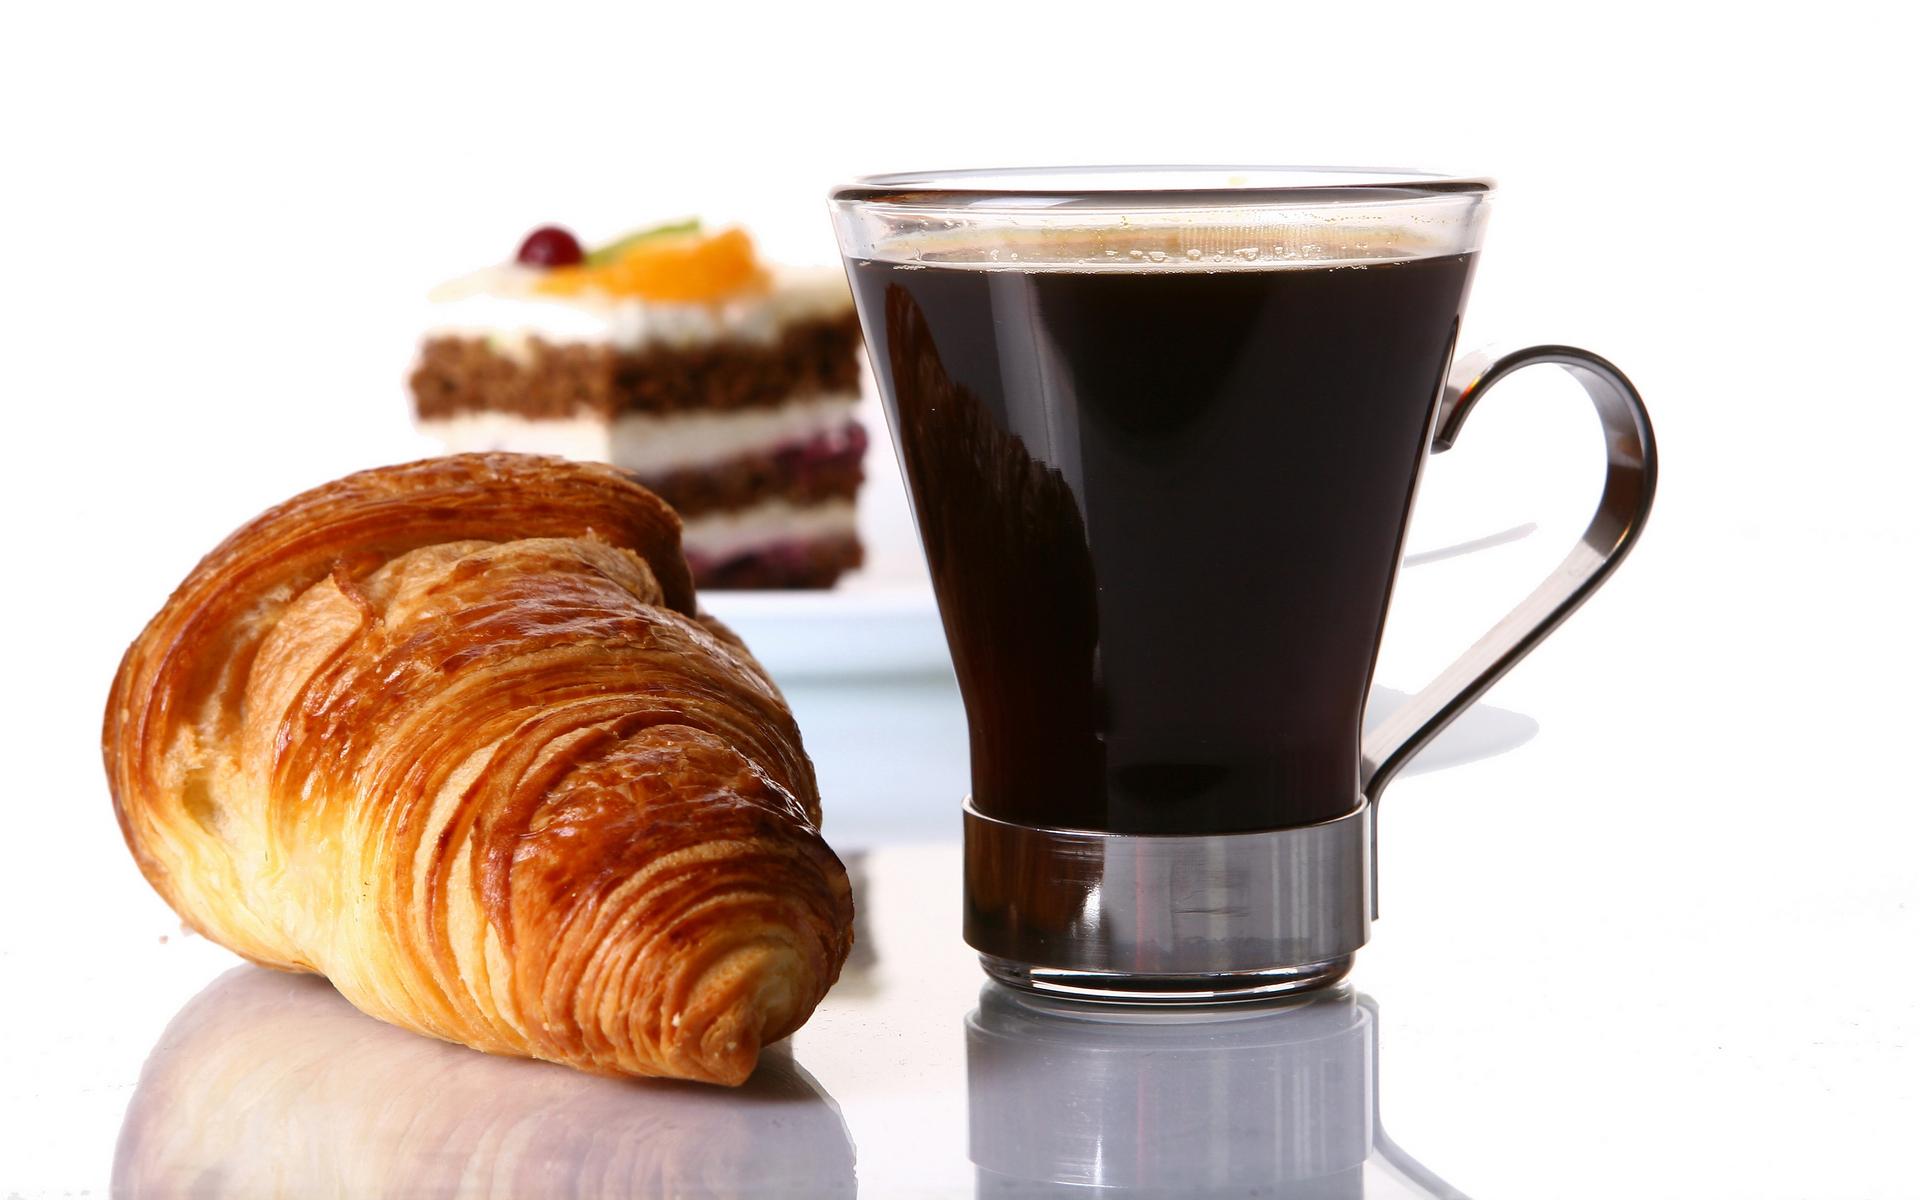 еда круасаны кофе повидло варенье food croissants coffee jam без смс